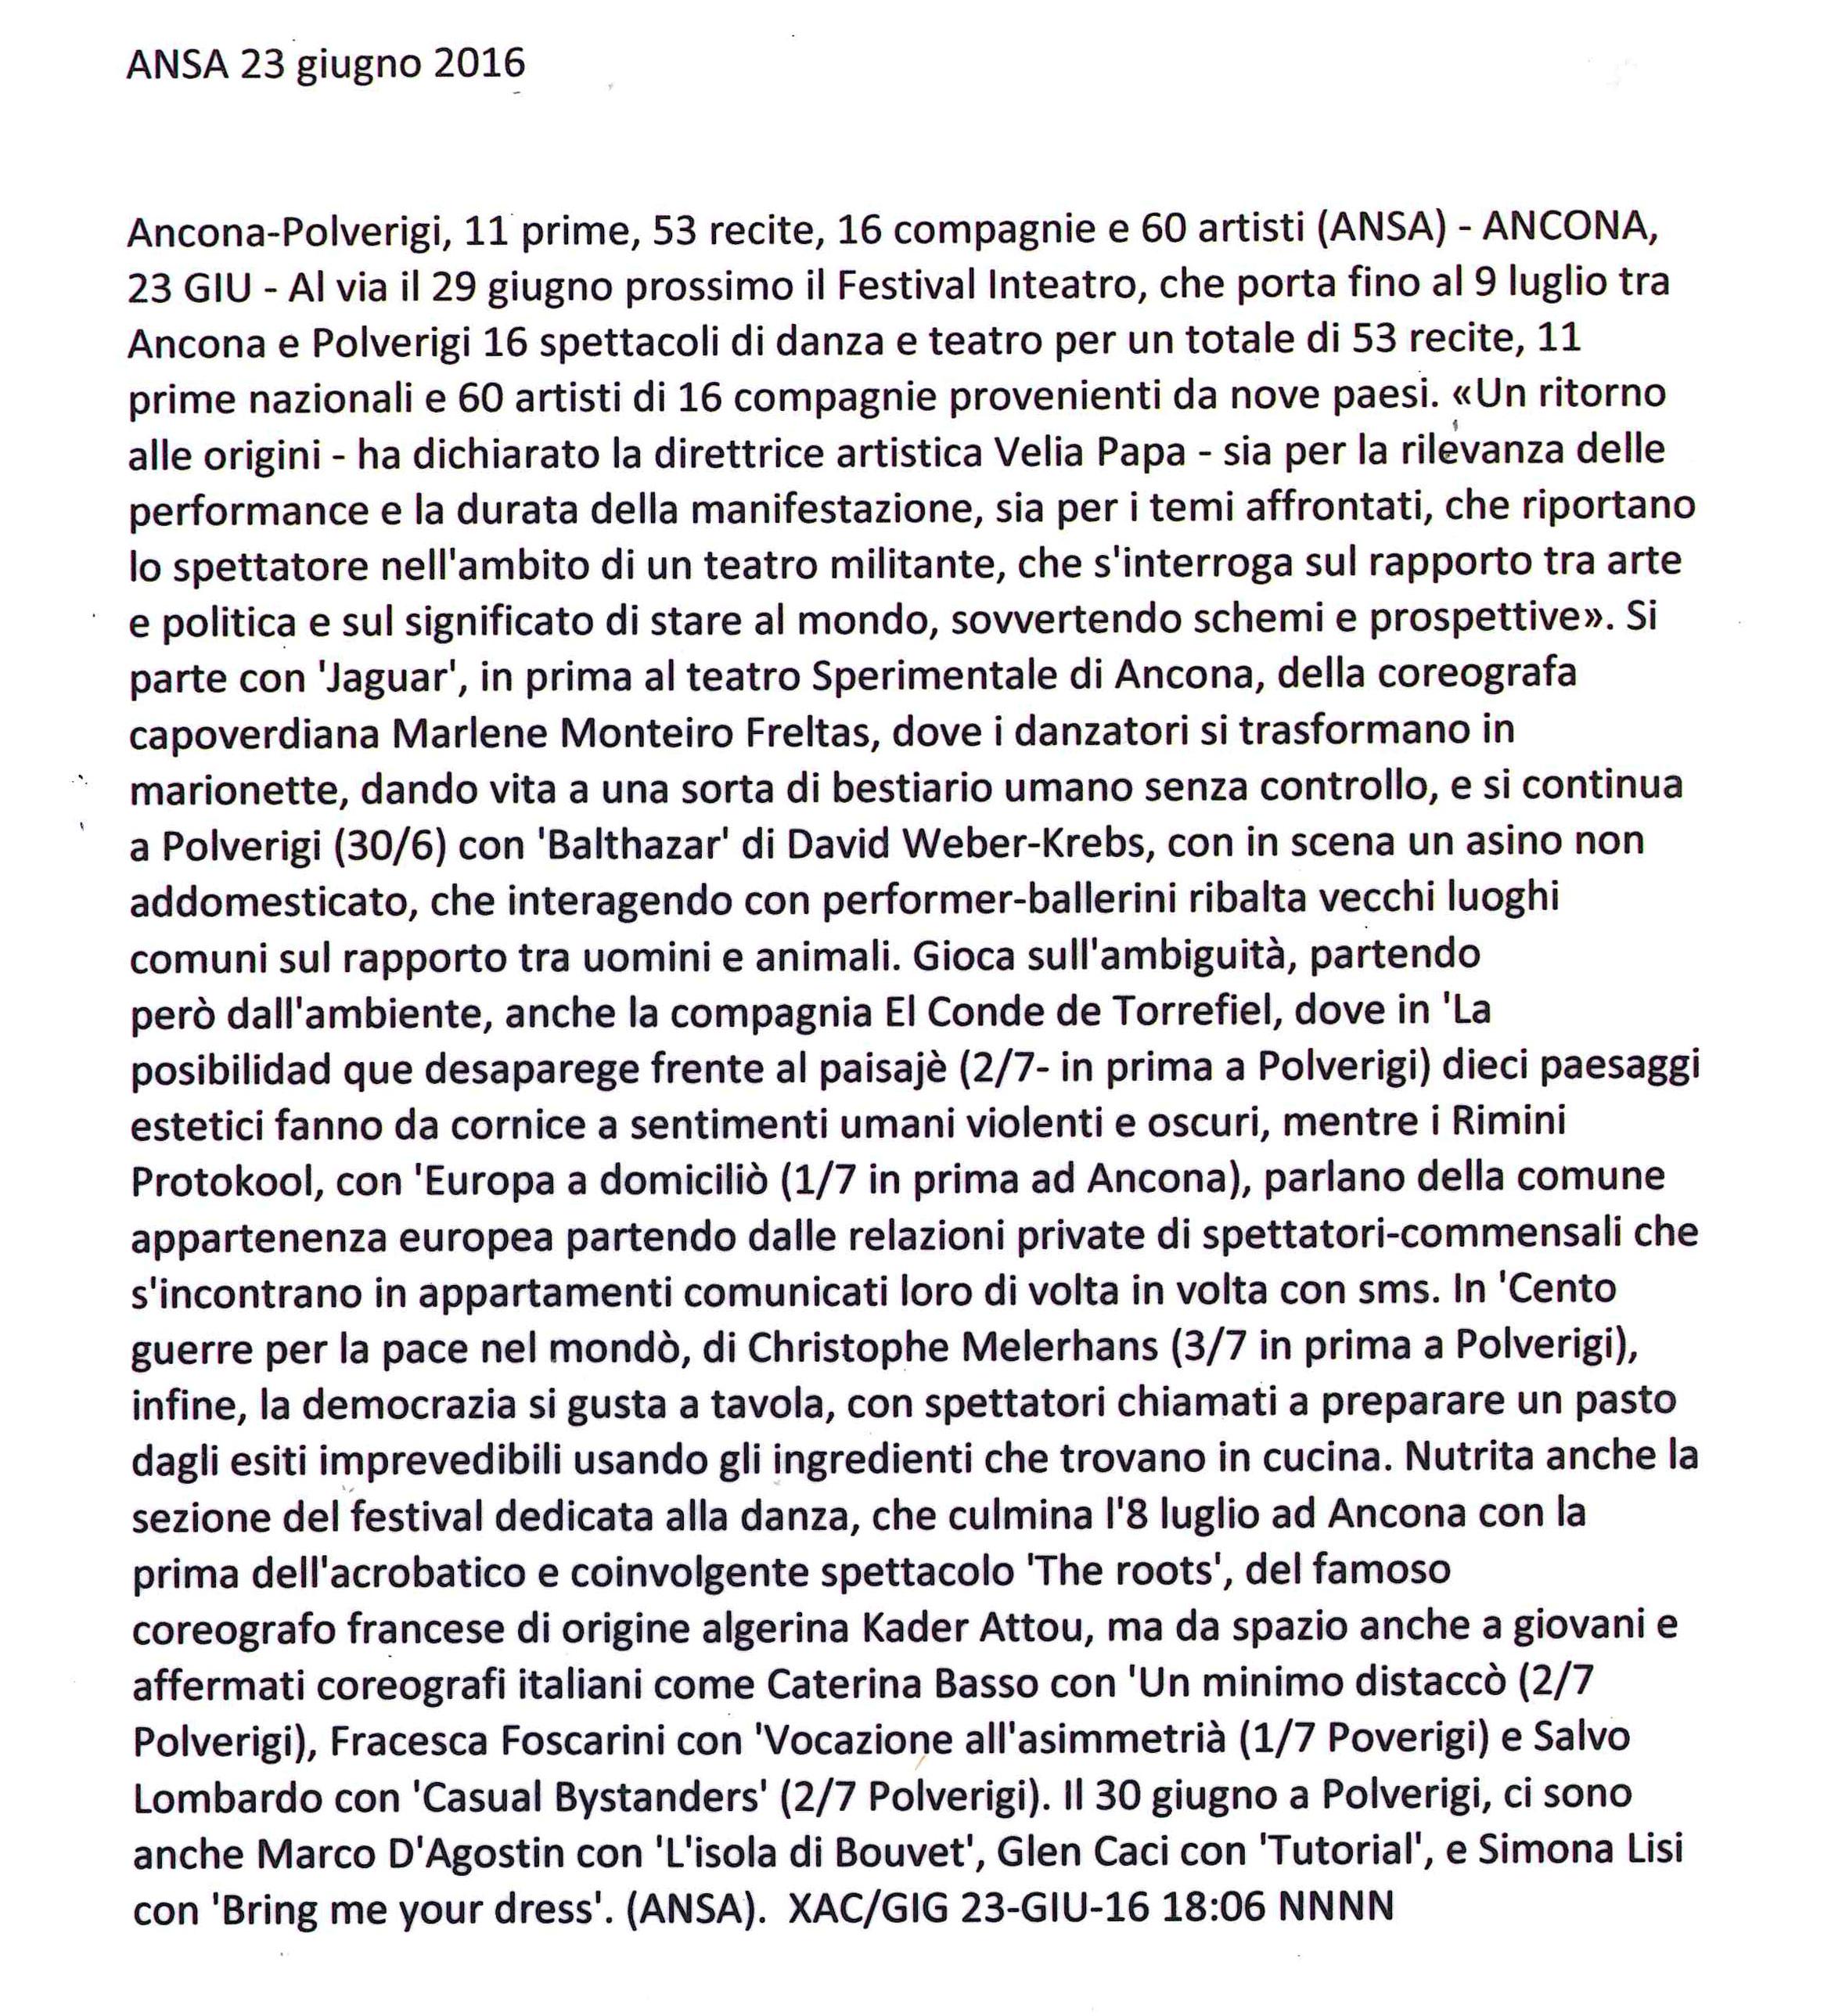 2016_06_23_Ancona,Polverigi-11-prime_ansa